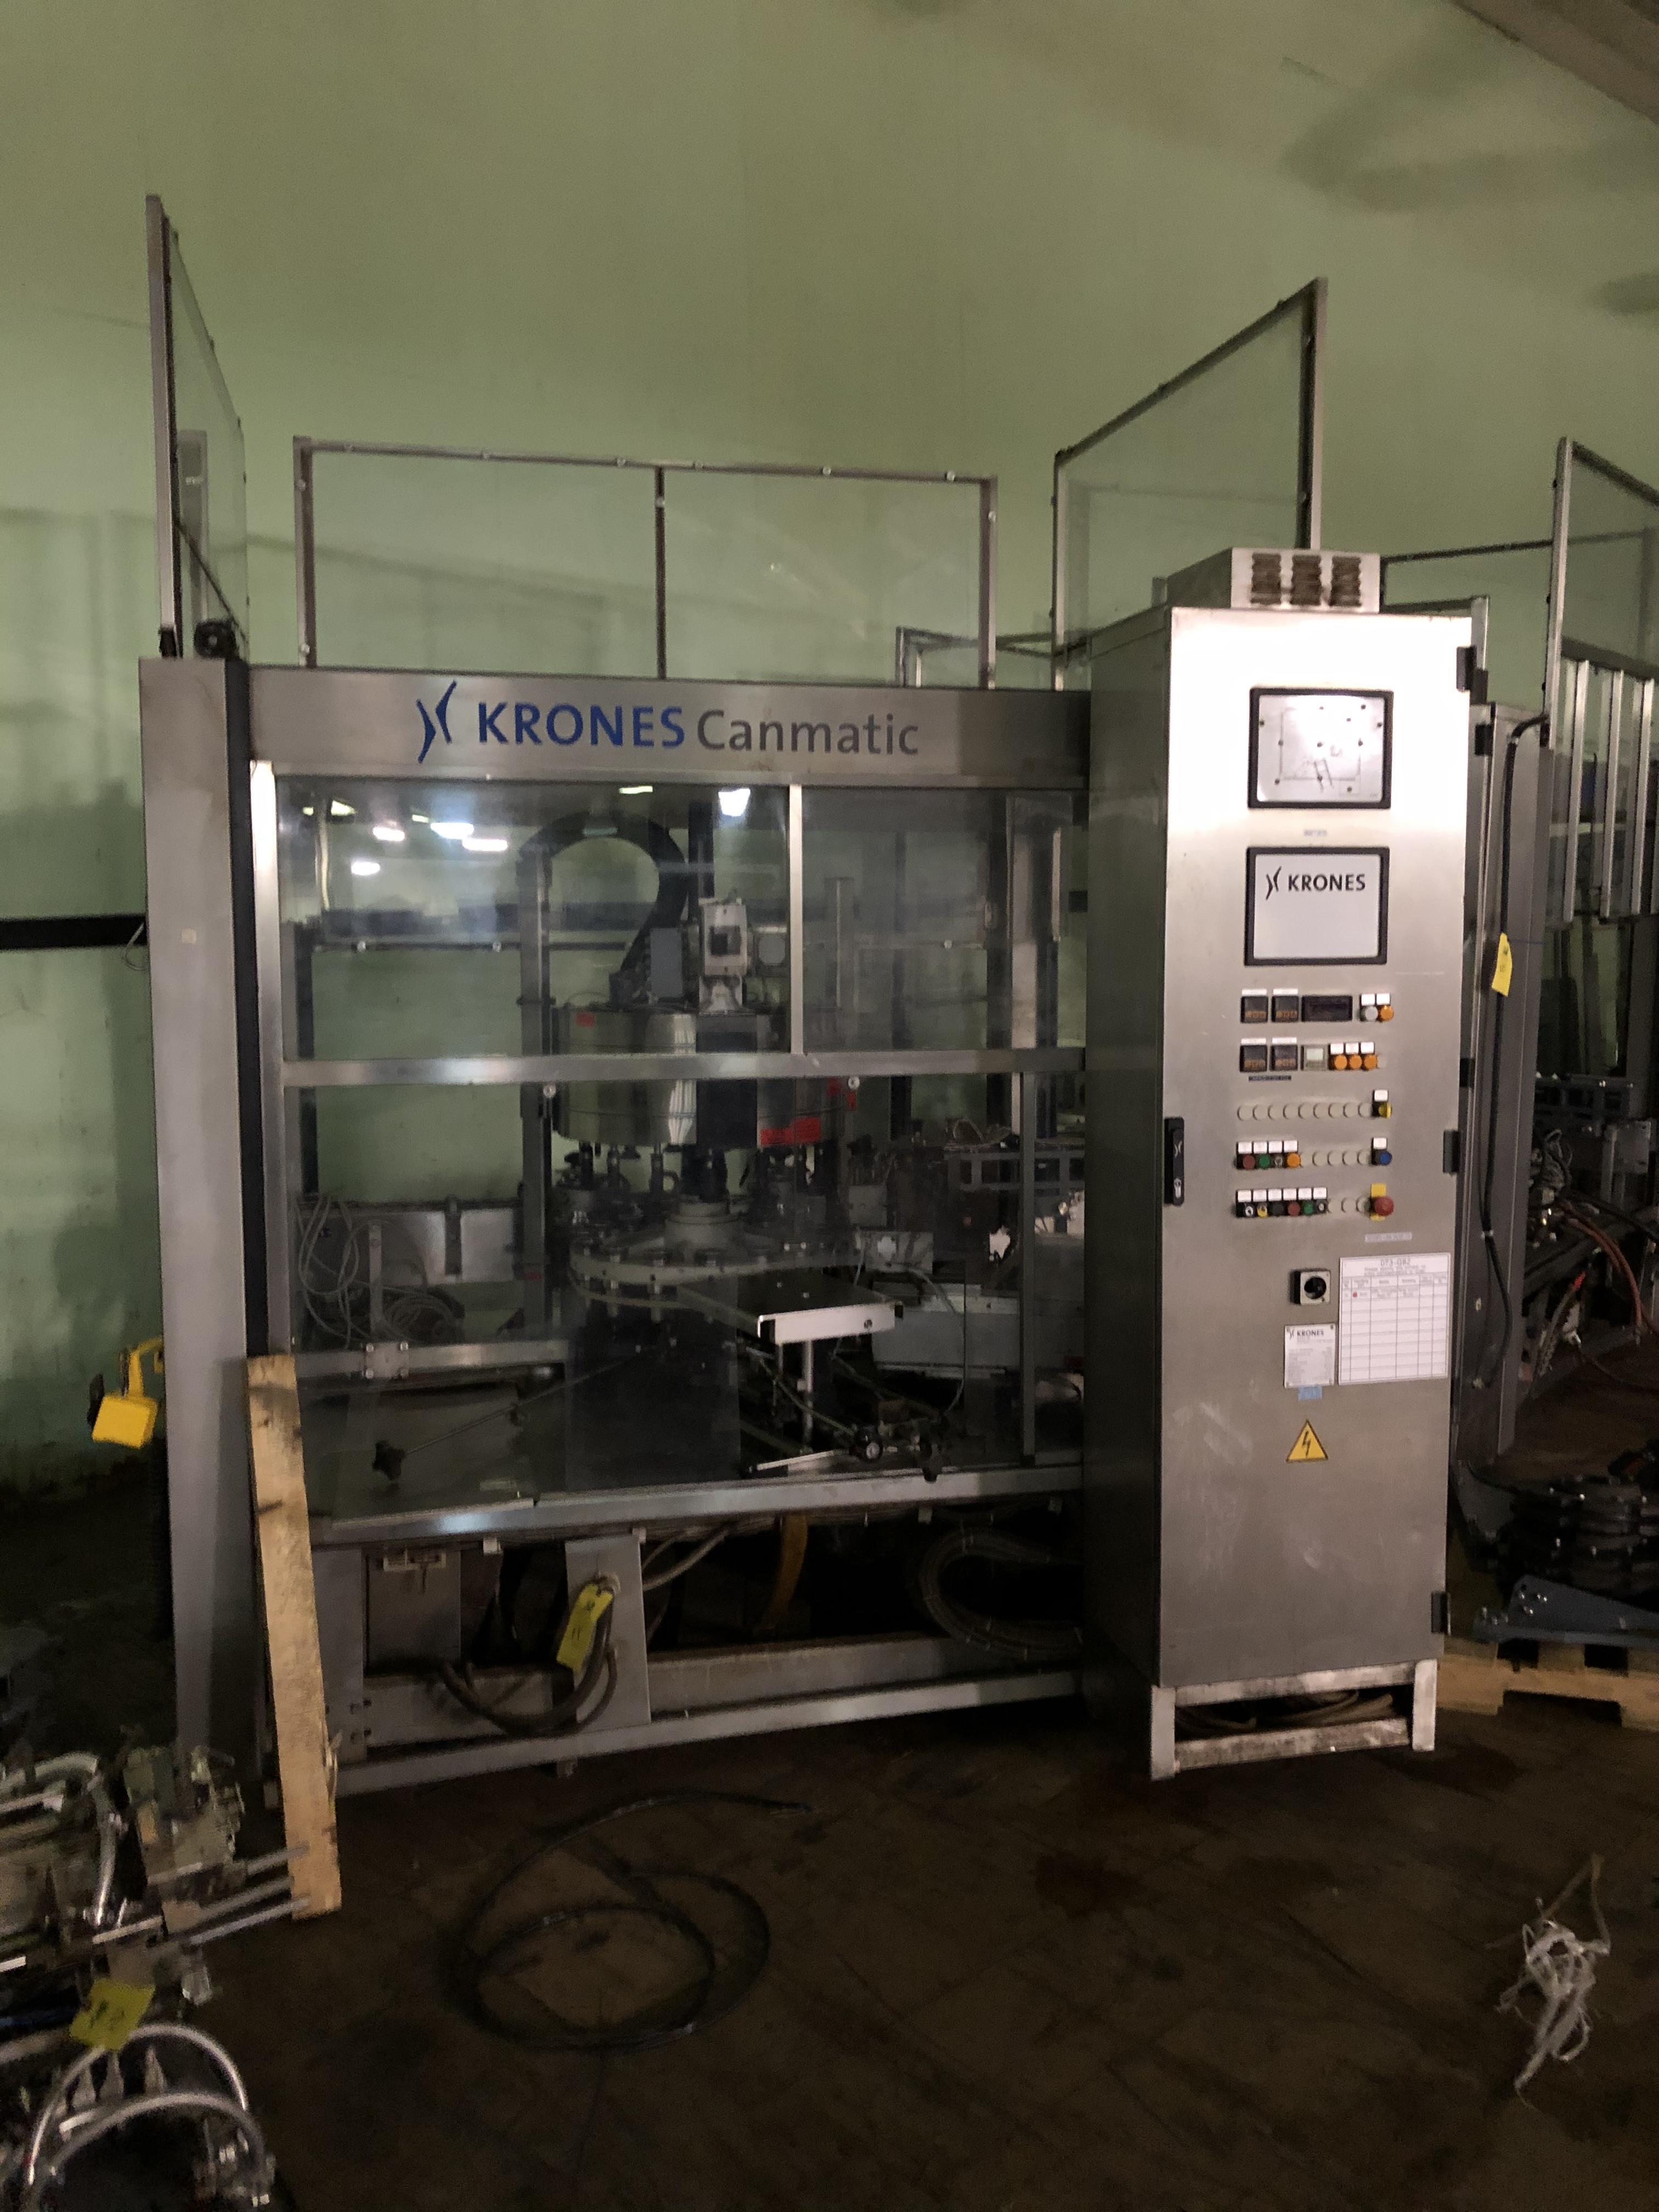 Krones Canmatic Labeler, Machine #073-Q82, RIGGING FEE - $1750